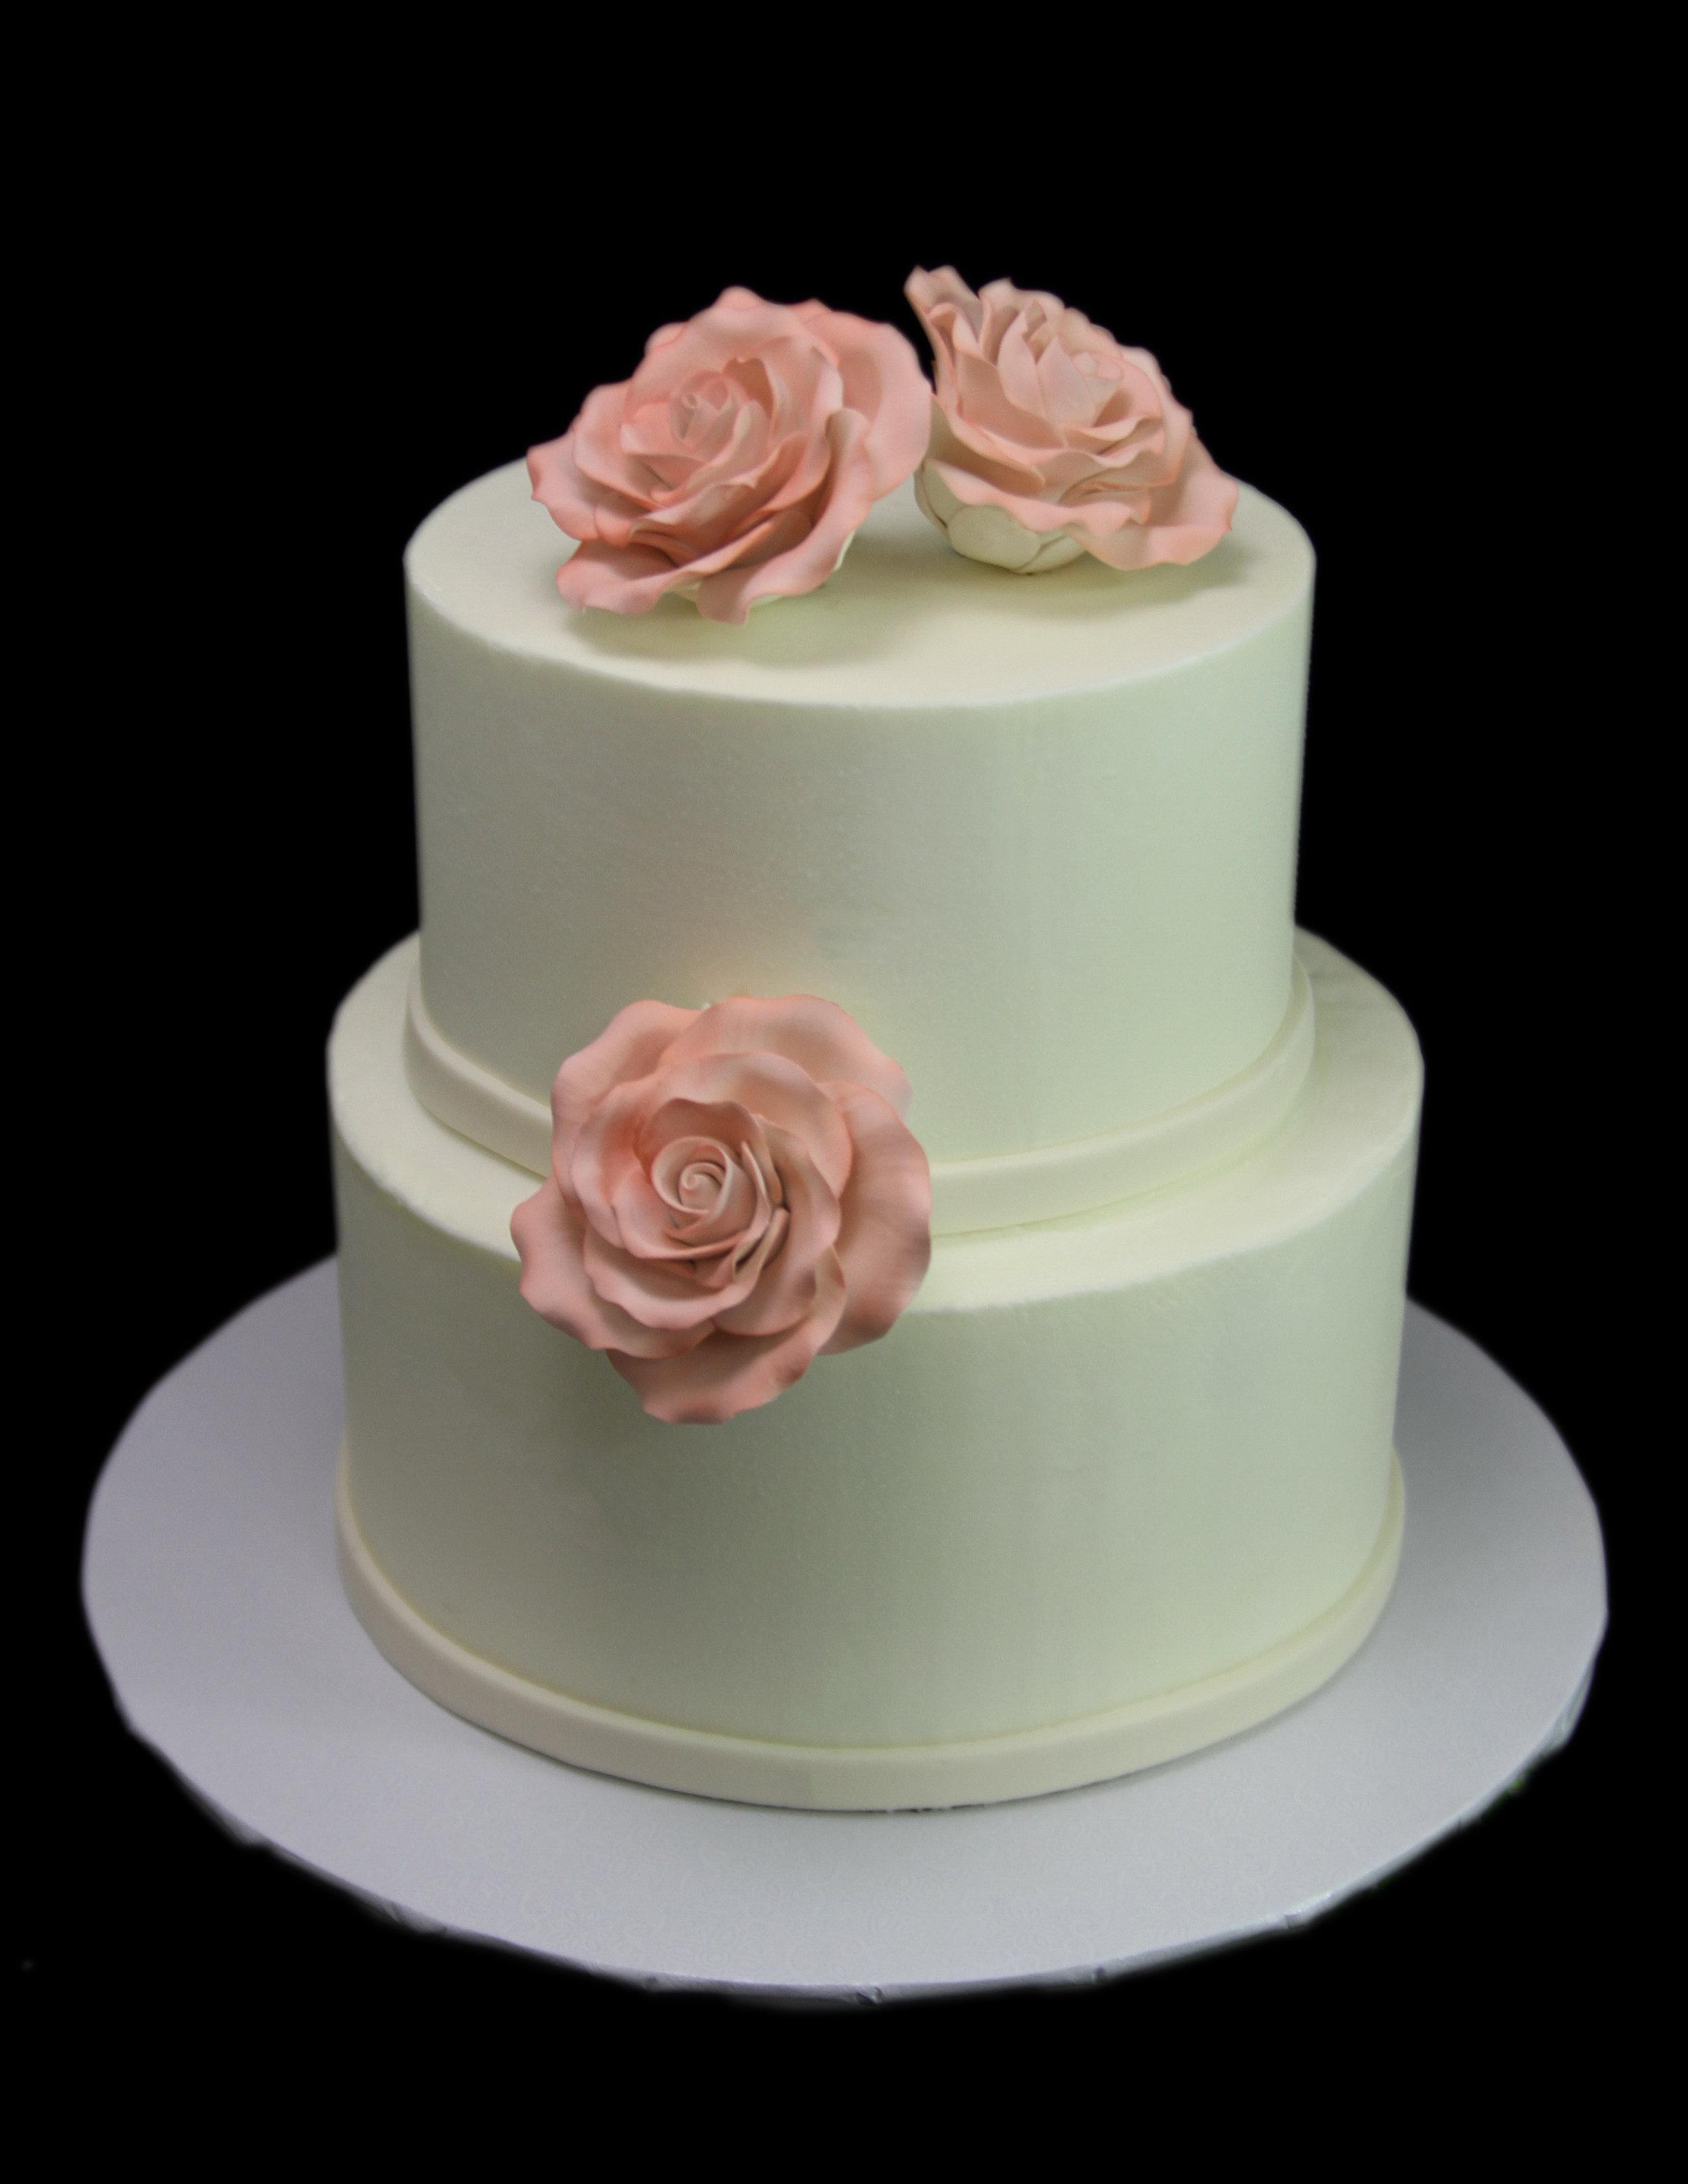 Roses Small Wedding Cake.jpg